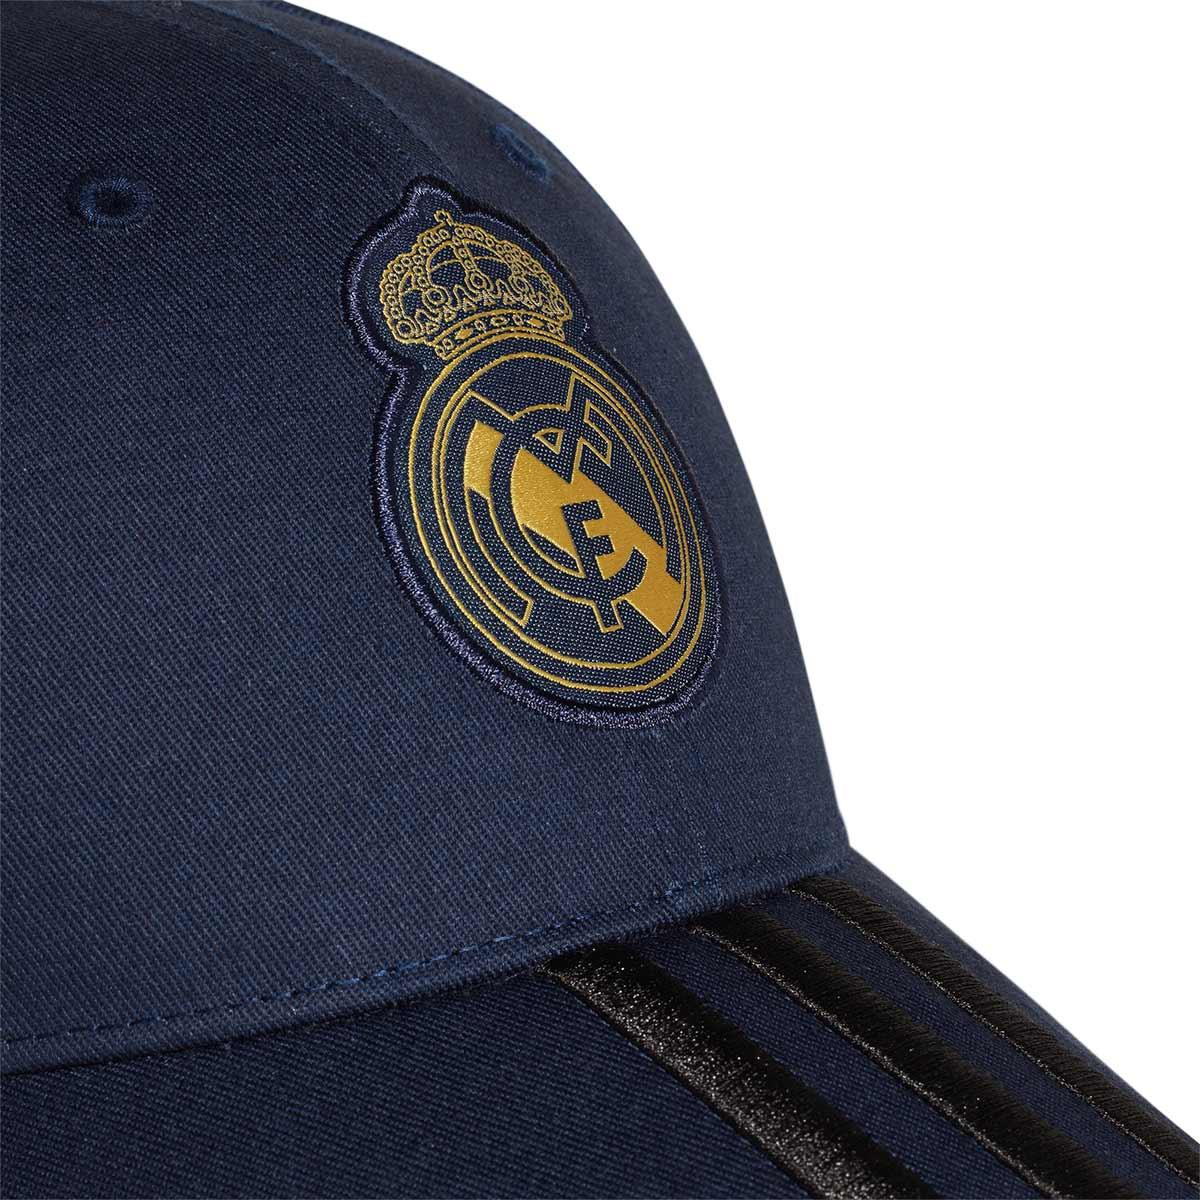 642551f5c Gorra Real Madrid C40 2019-2020 Night indigo-Black-Matte gold